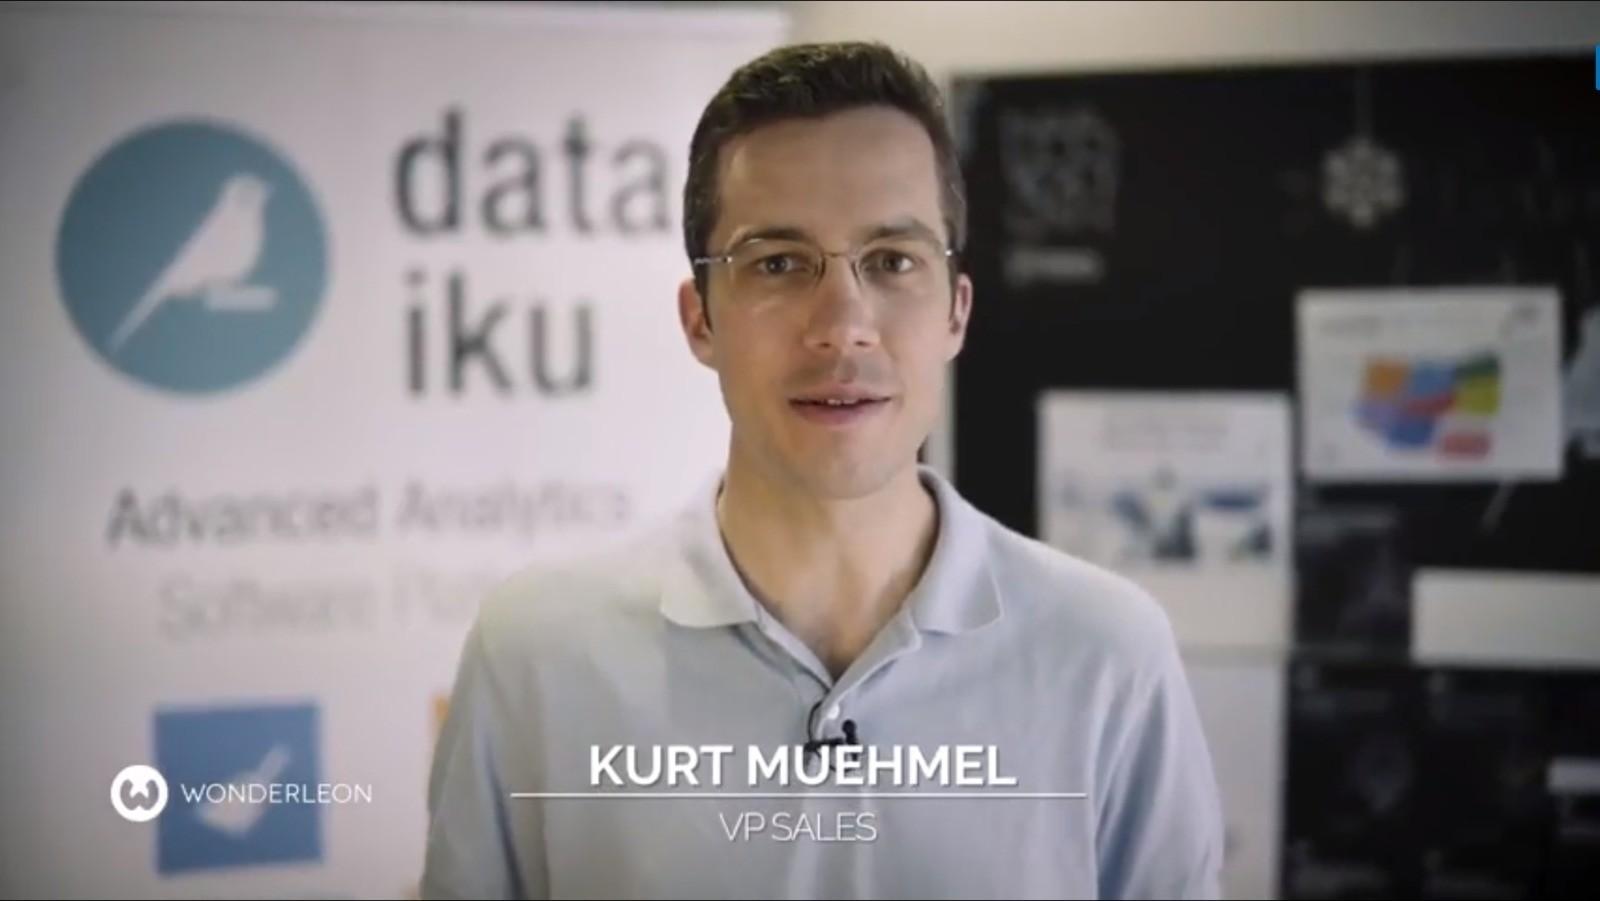 Kurt, VP Sales EMEA @Dataiku